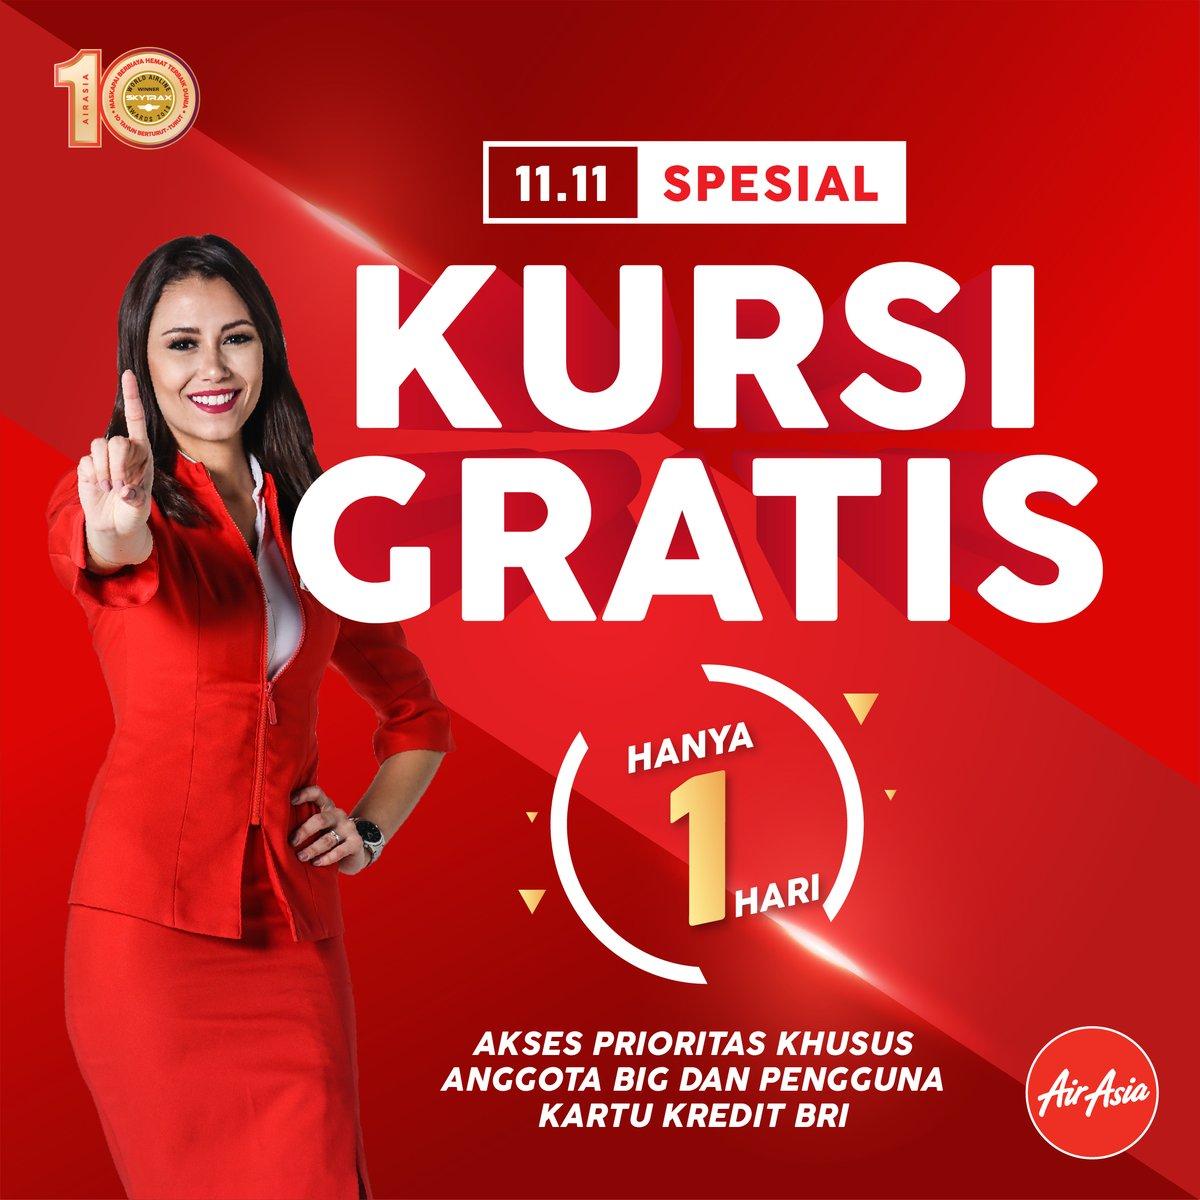 AirAsia - Promo Spesial HARBOLNAS 11.11 5 Juta Kursi Promo Liburan (11 Nov 2018)